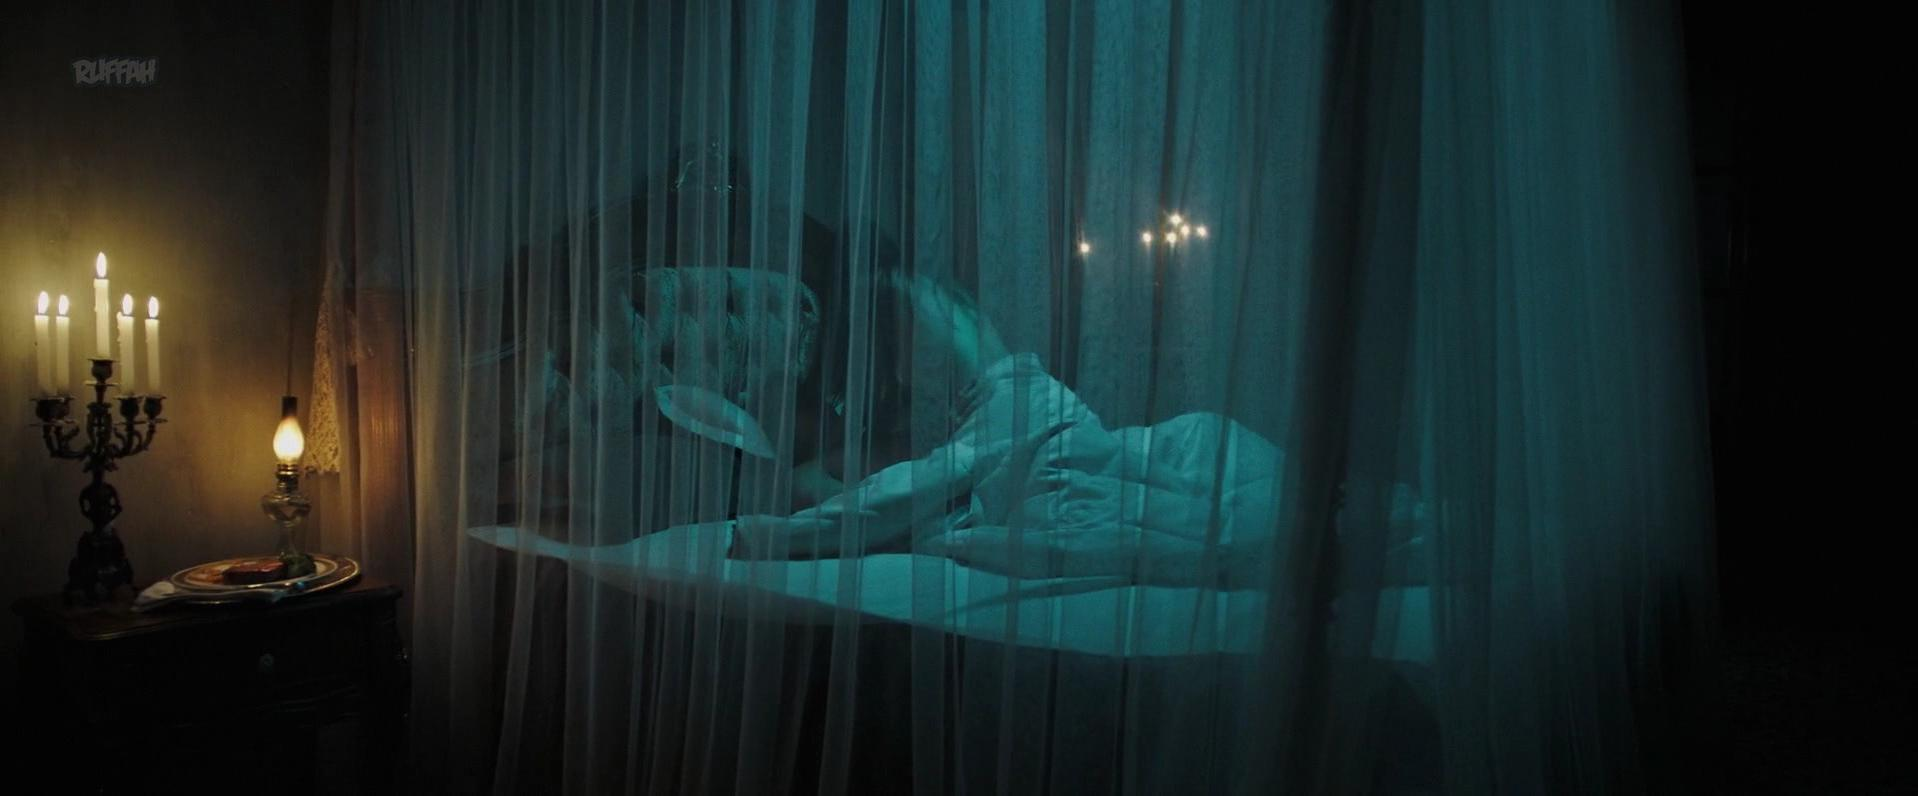 Kate Nhung nude - The Housemaid (2016)